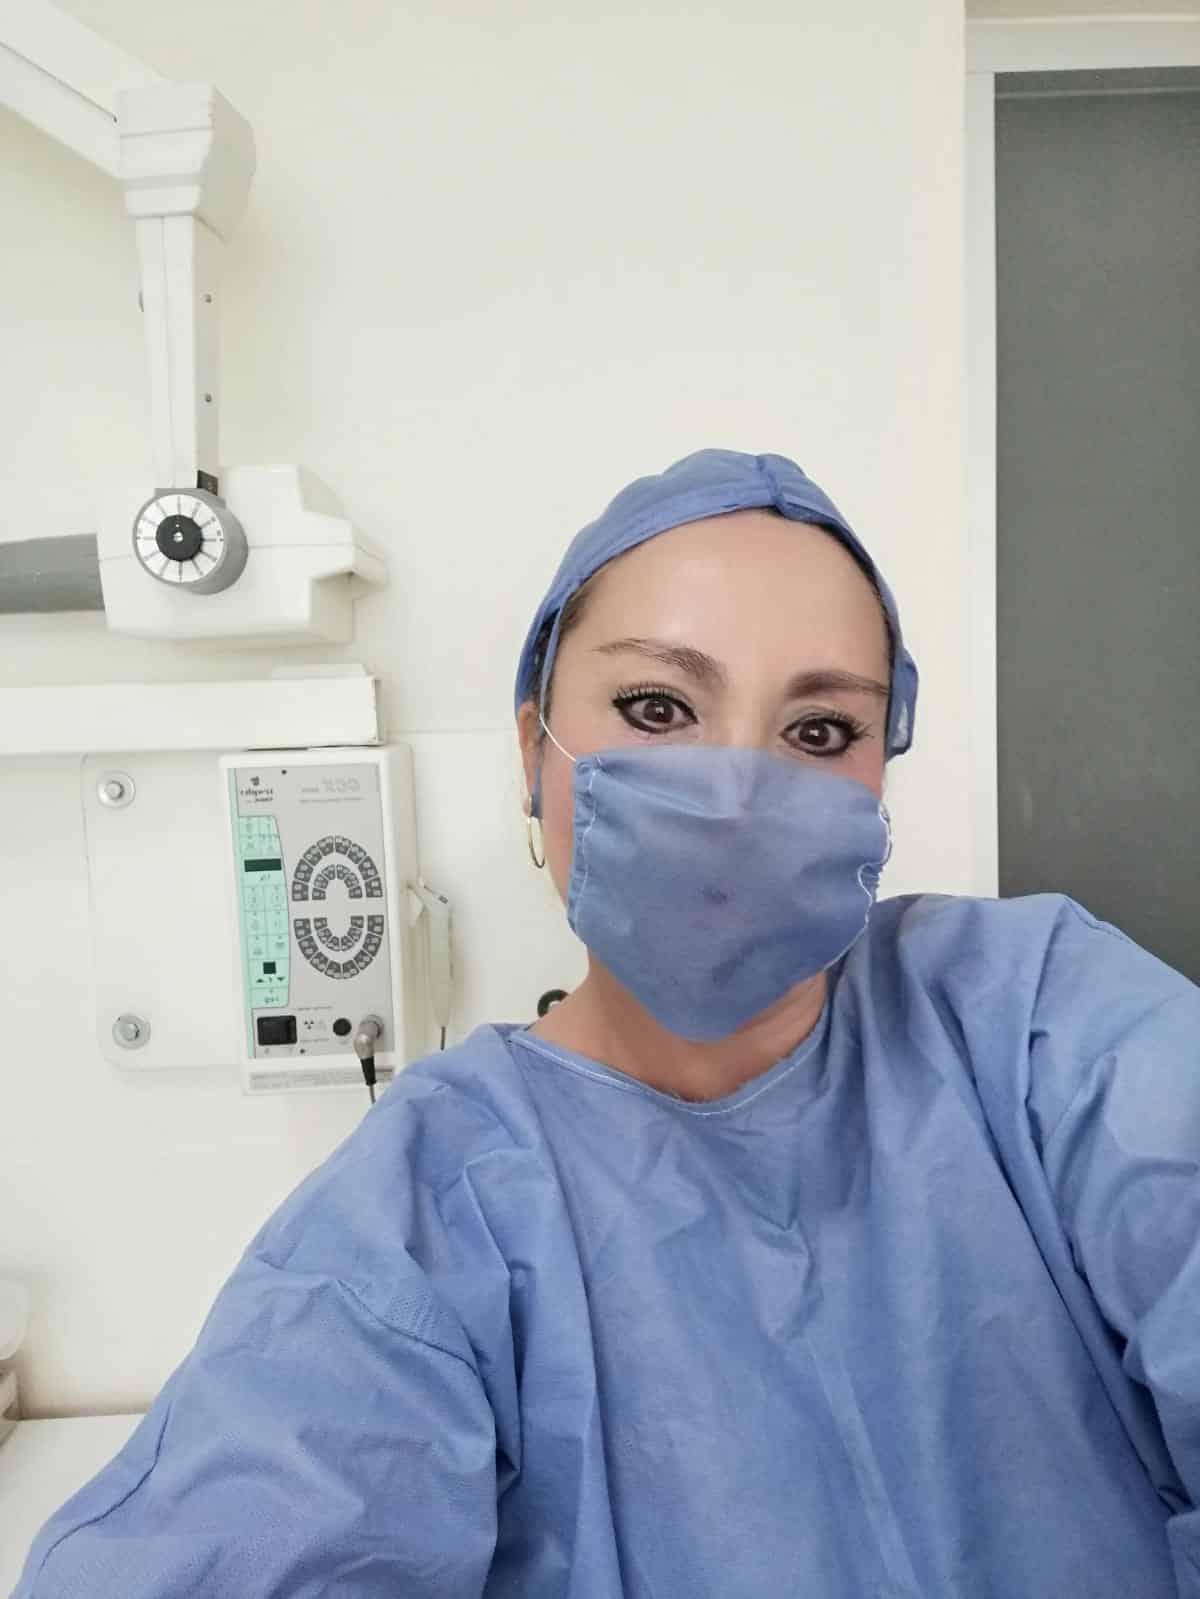 Odontopediatra en zapopan